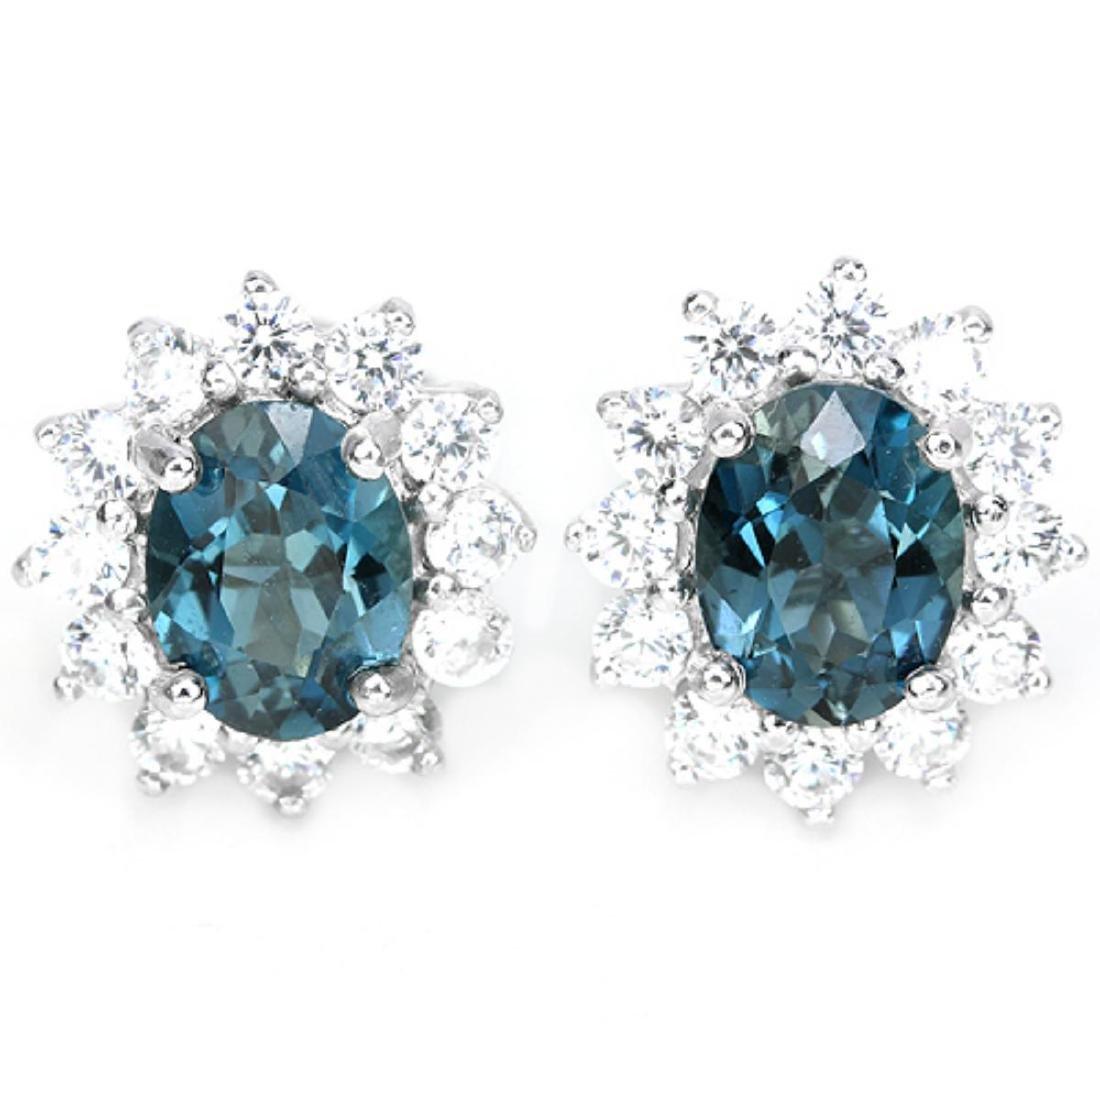 Natural London Blue Topaz 8x6 MM Earrings